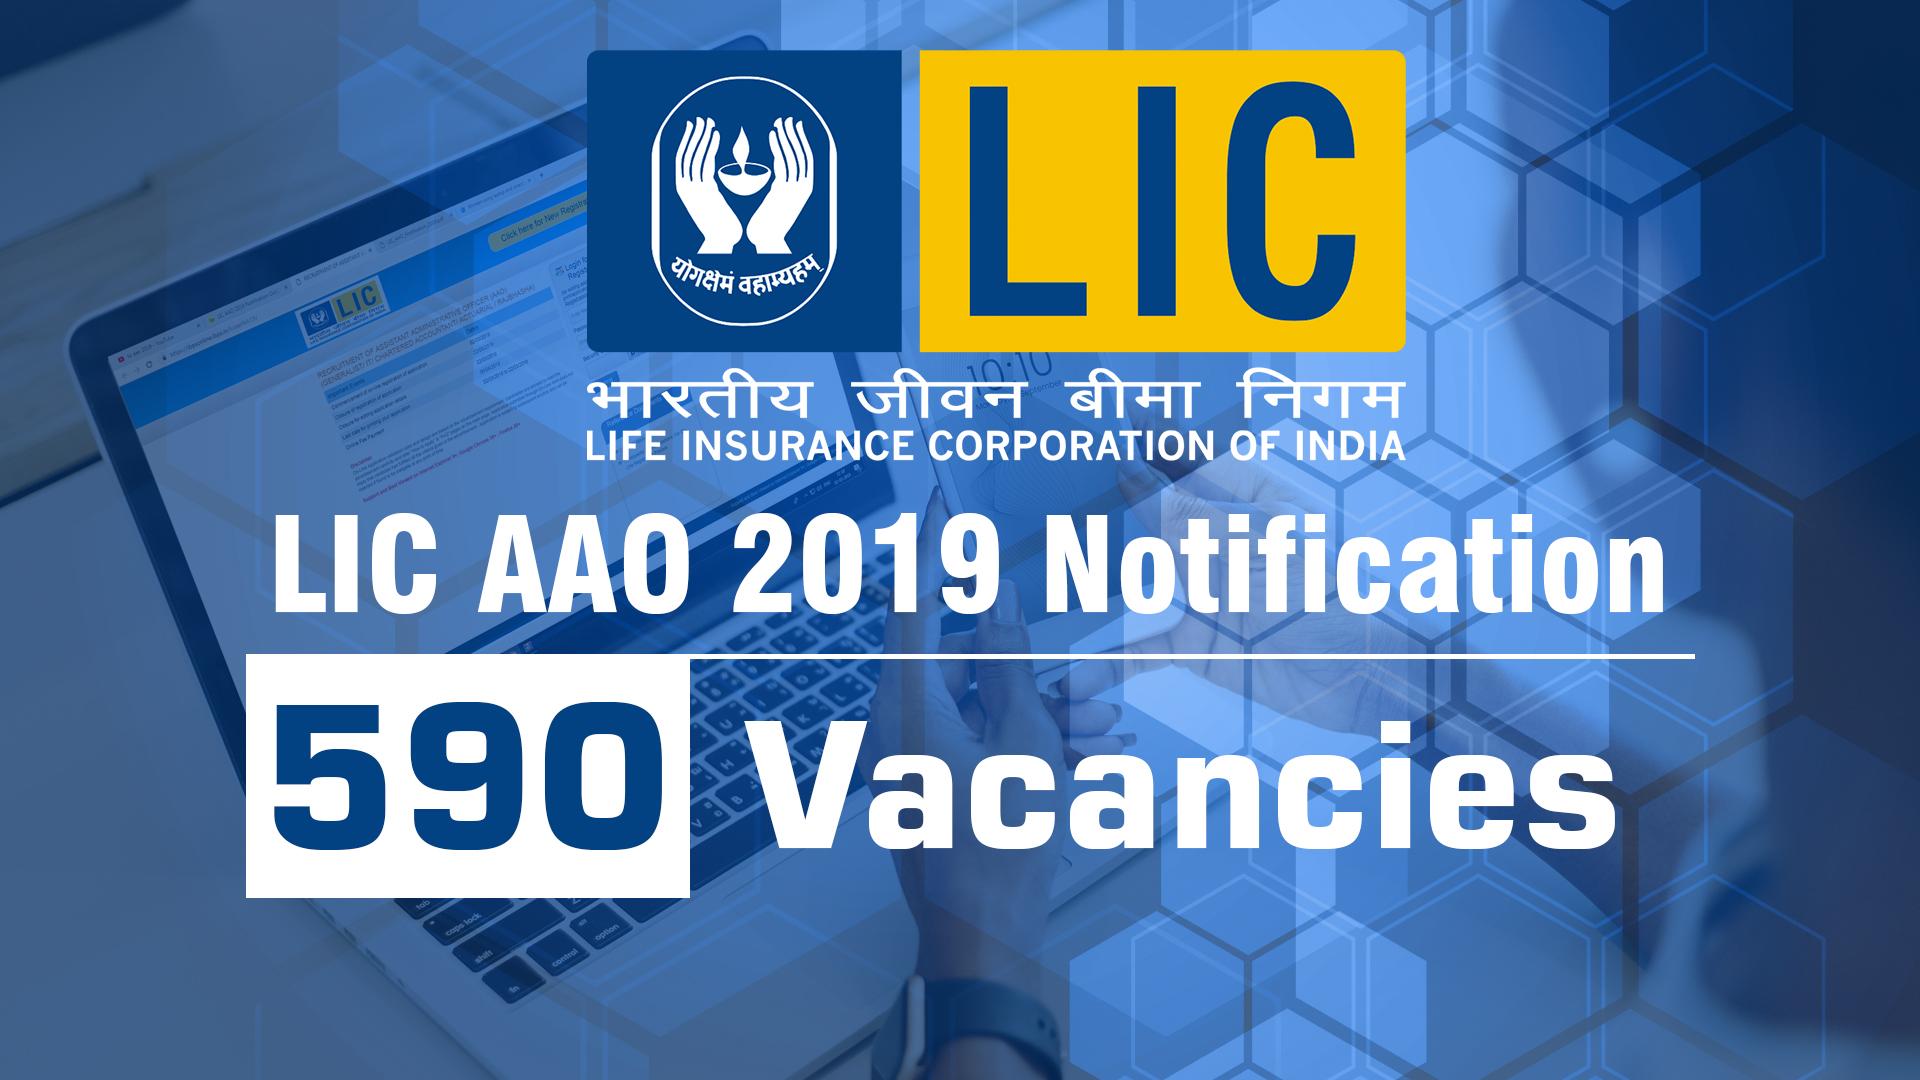 LIC AAO Recruitment Notification 2019 | 590 Vacancies | Any Degree Qualification